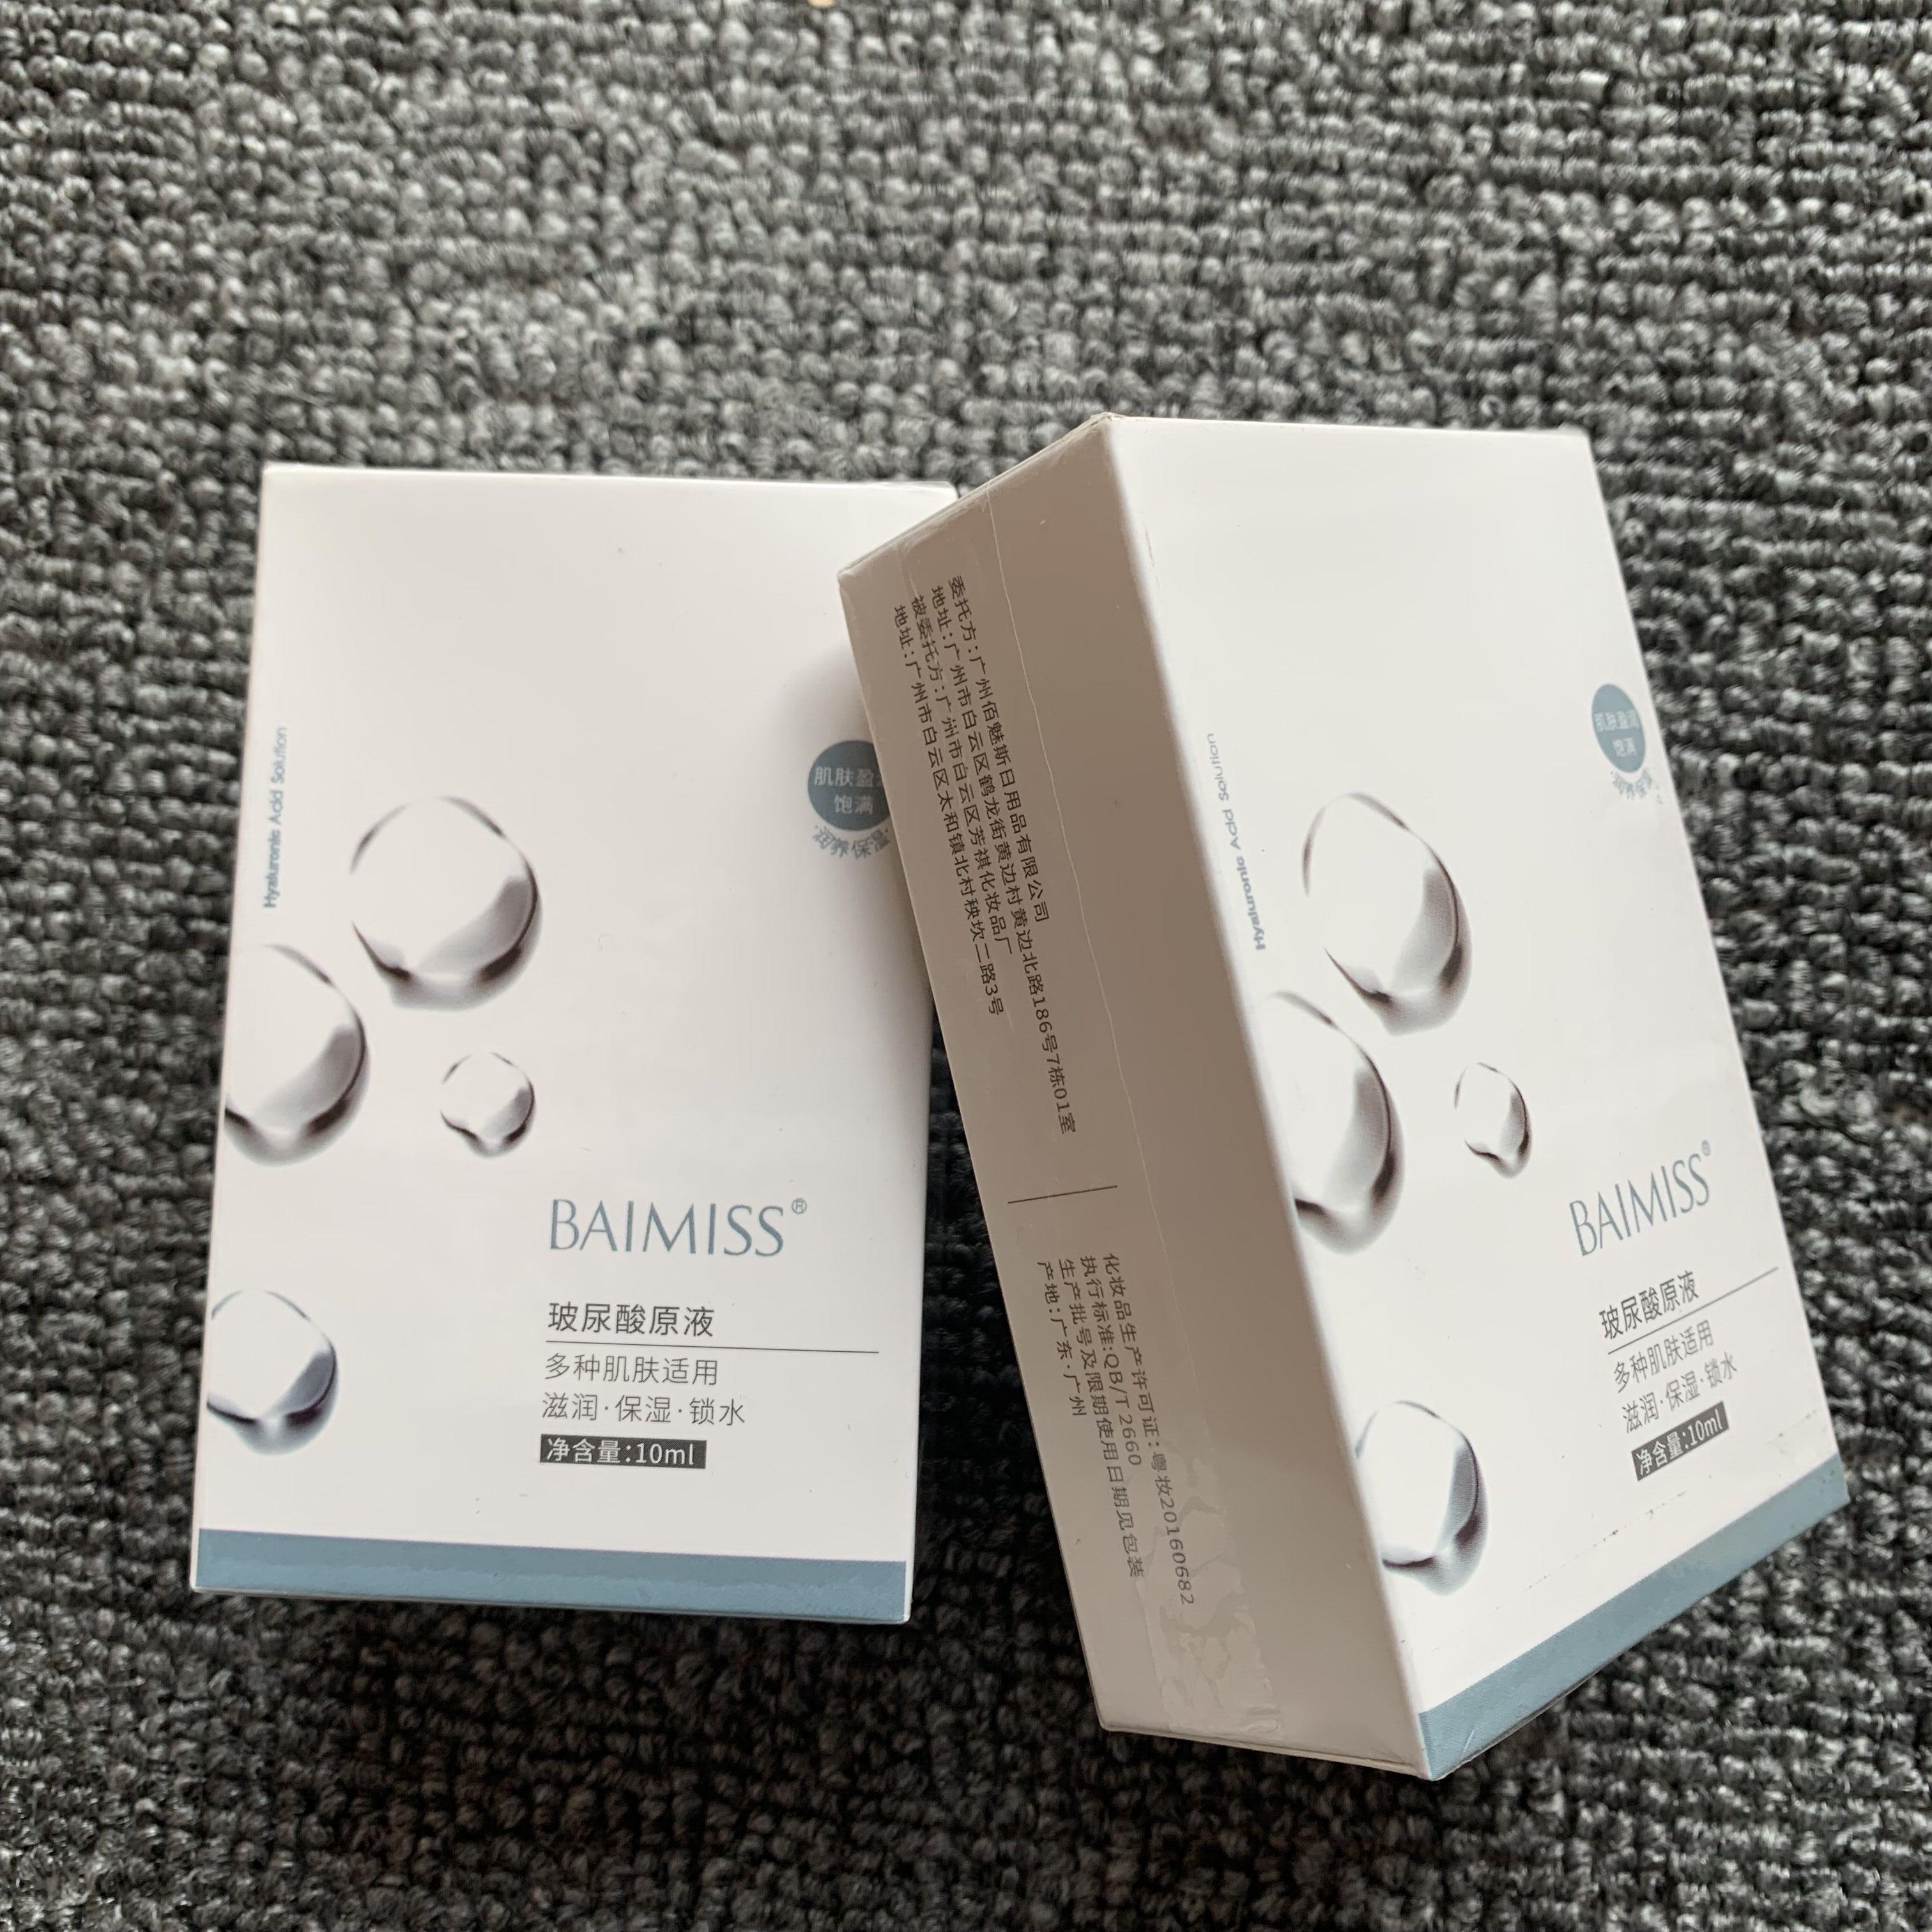 Korean Cosmetics Hyaluronic Acid Injections Serum Hunique Ageless Face Cream Skin Care Whitening Cream 2Pcs